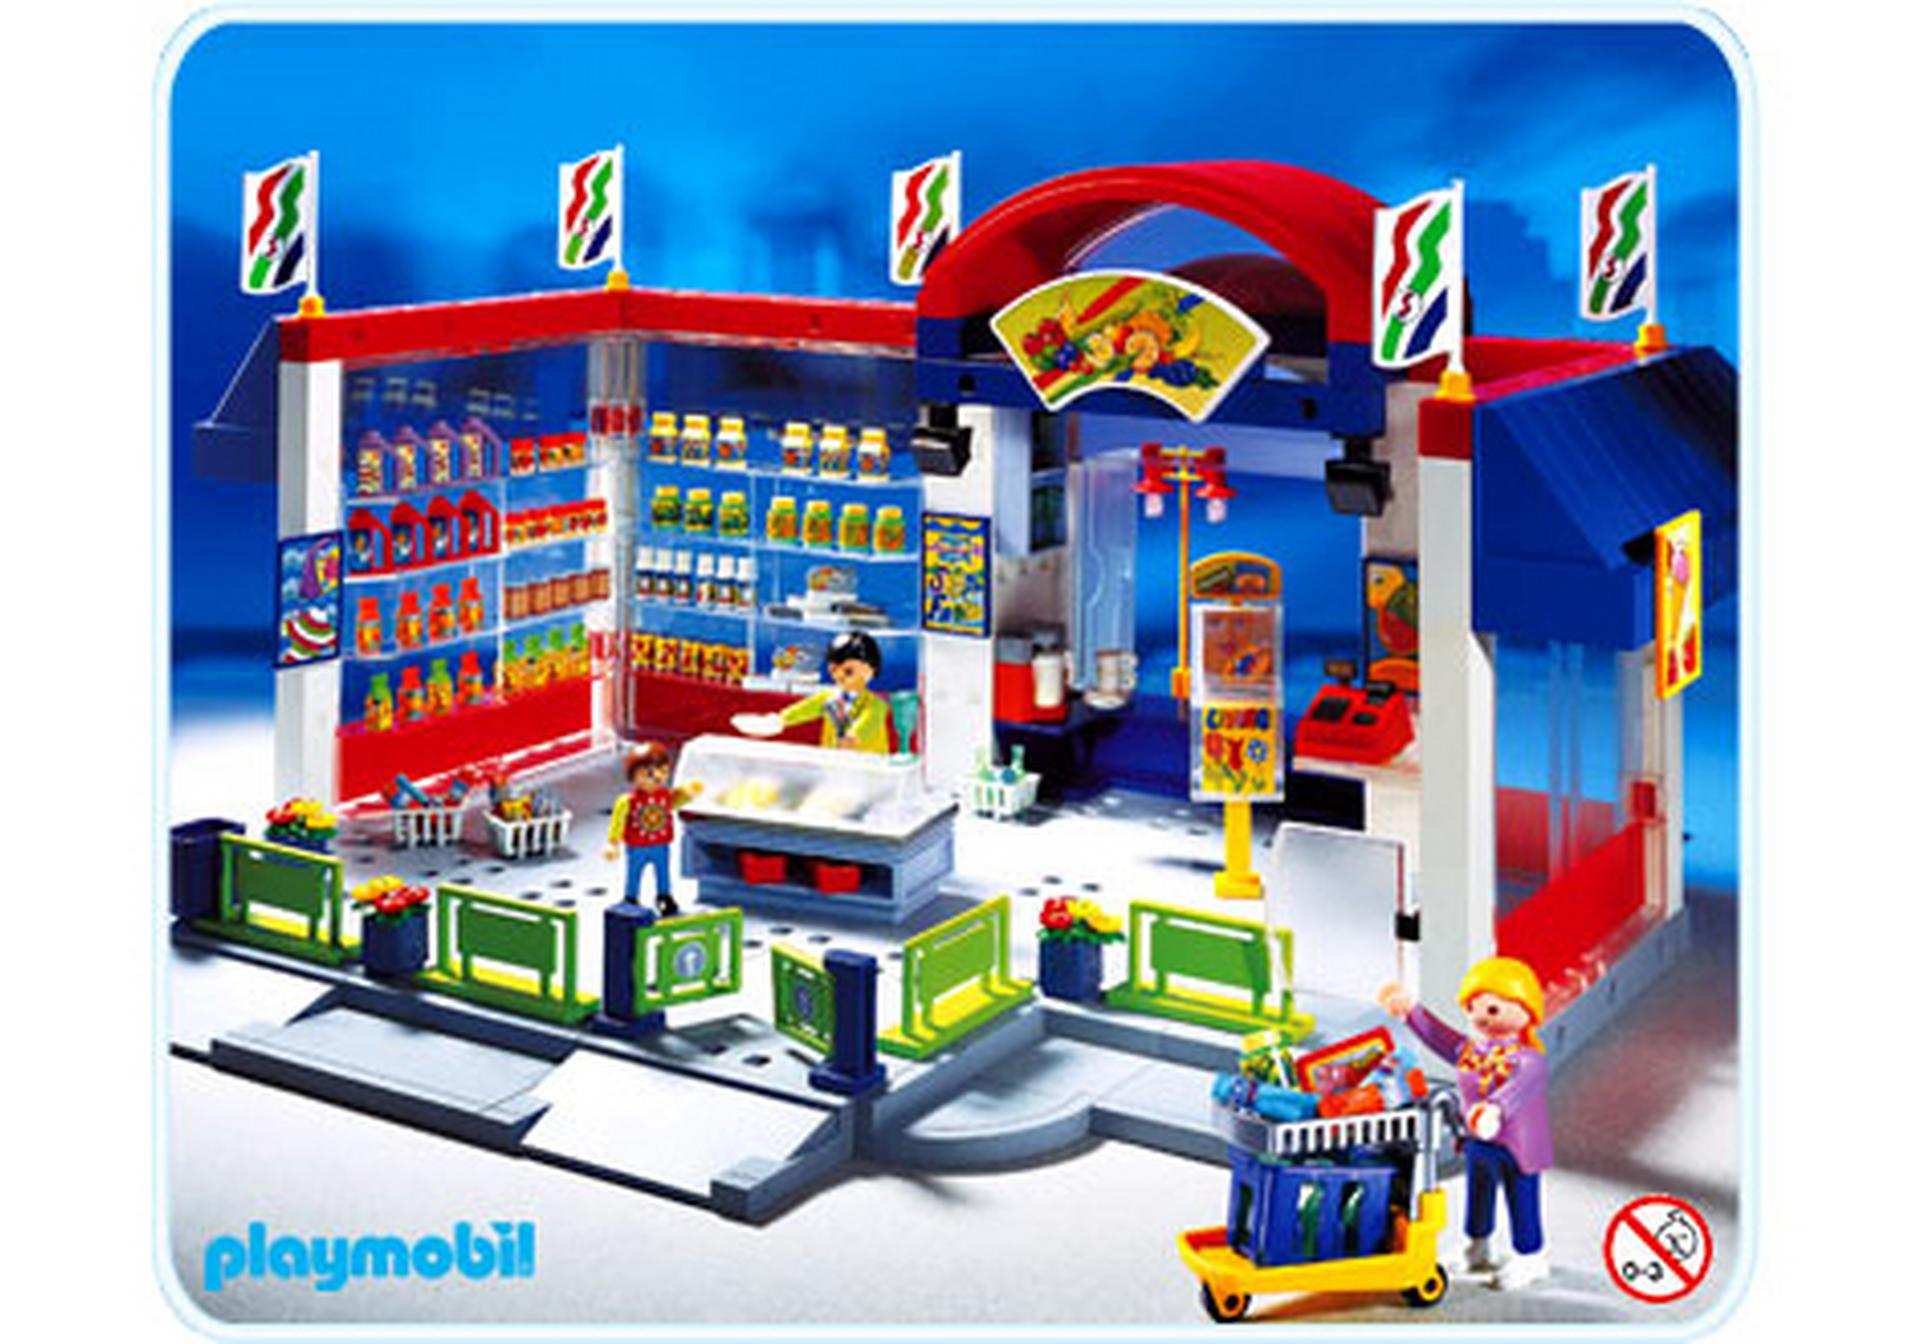 Supermarkt 3200 a playmobil schweiz for Jugendzimmer playmobil